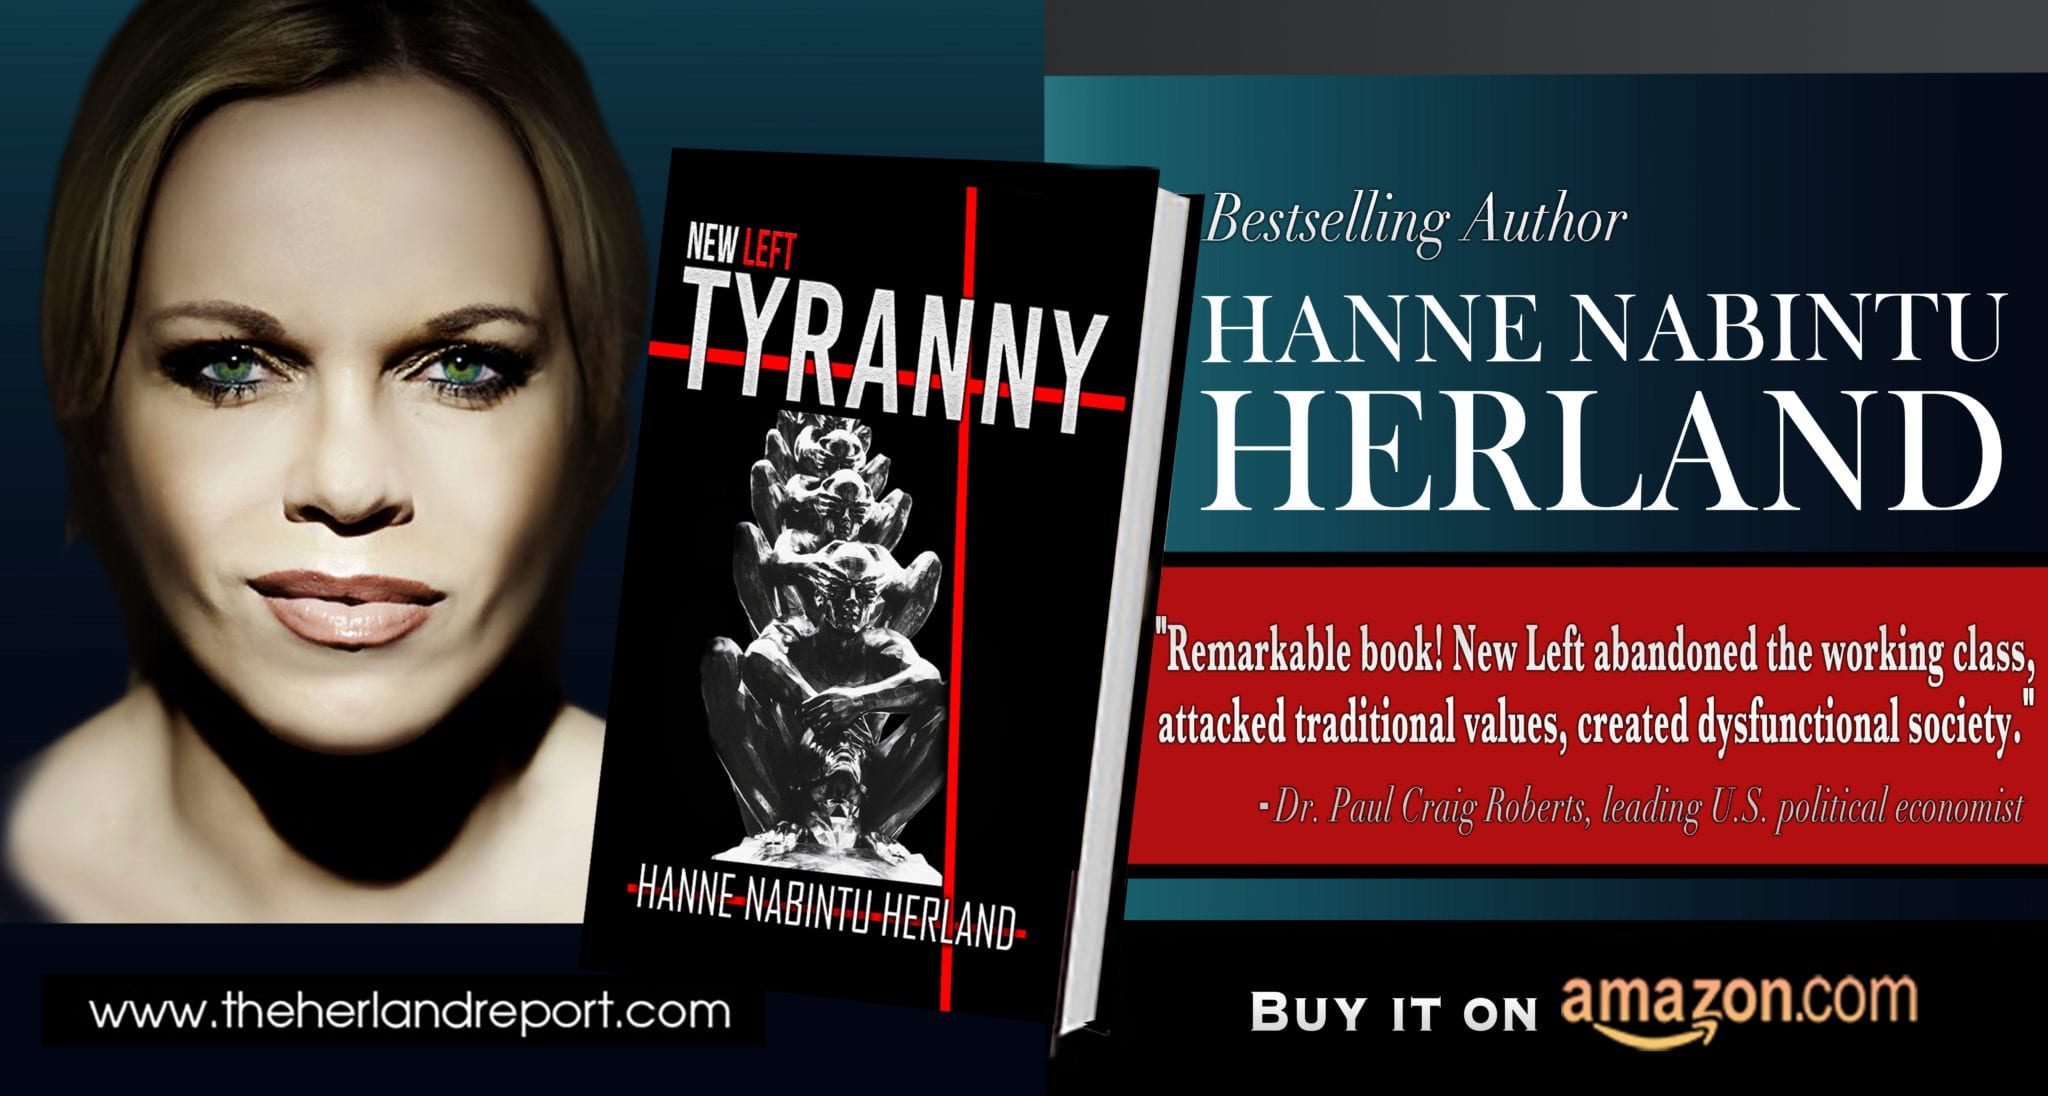 New Atheist Religion: New Left Tyranny, by bestselling author Hanne Nabintu Herland